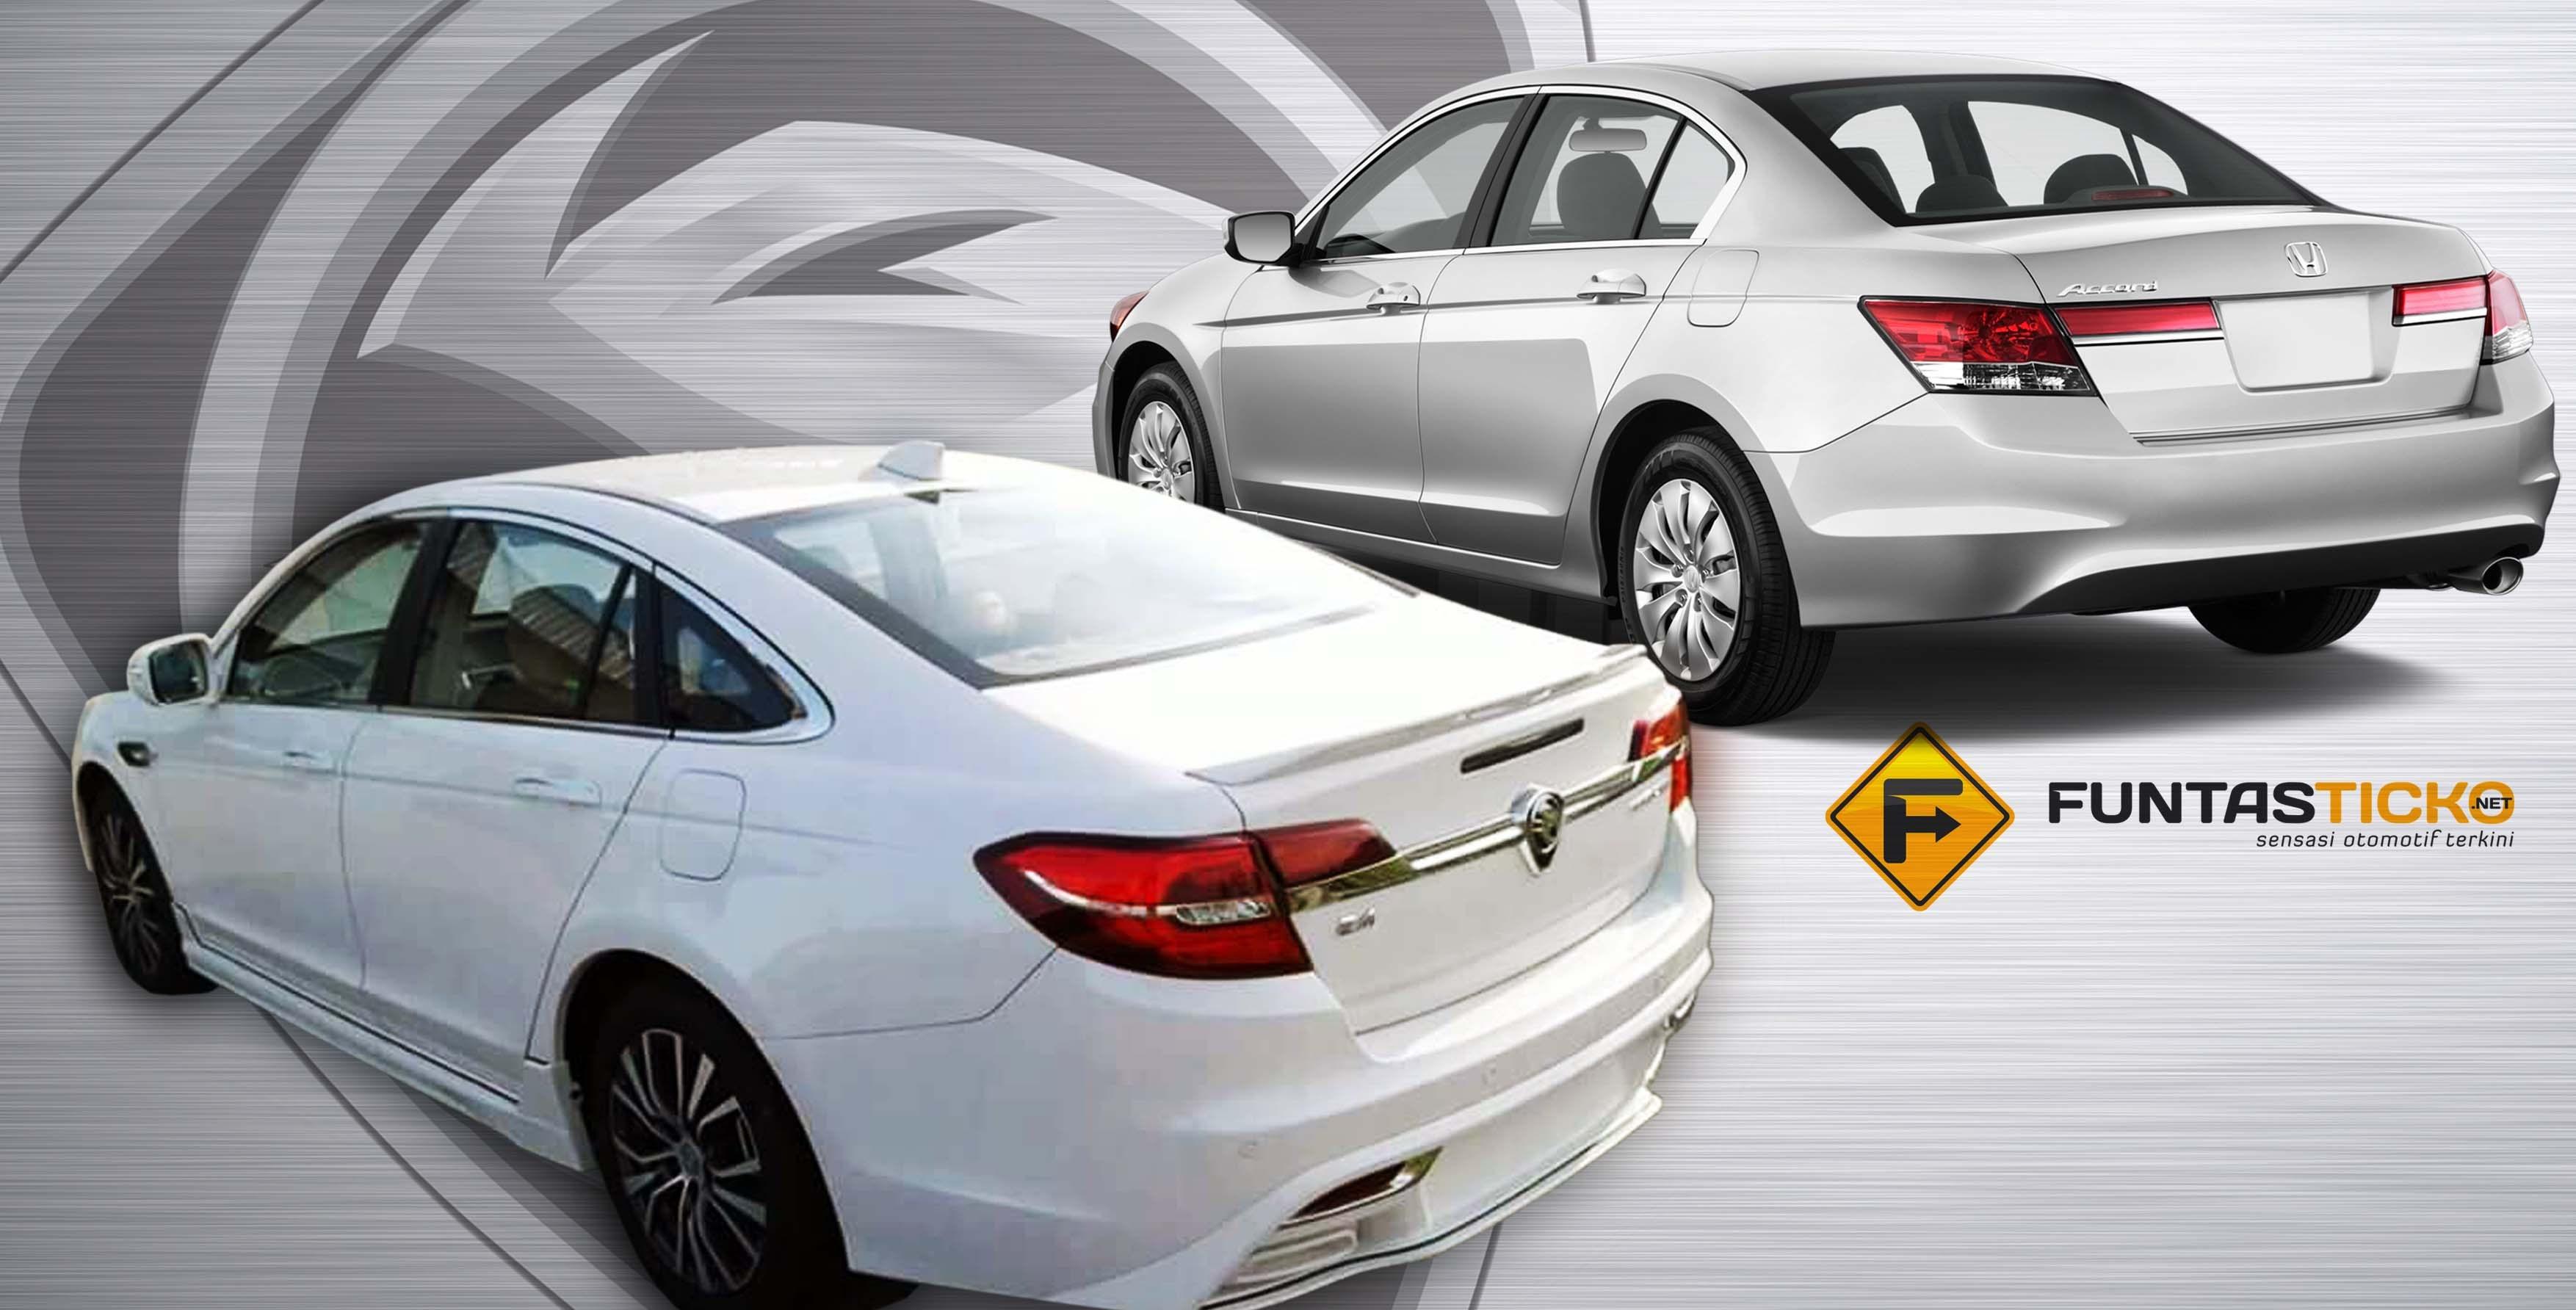 autoguide sedan x at accord price news honda auto pricing com the starts sport